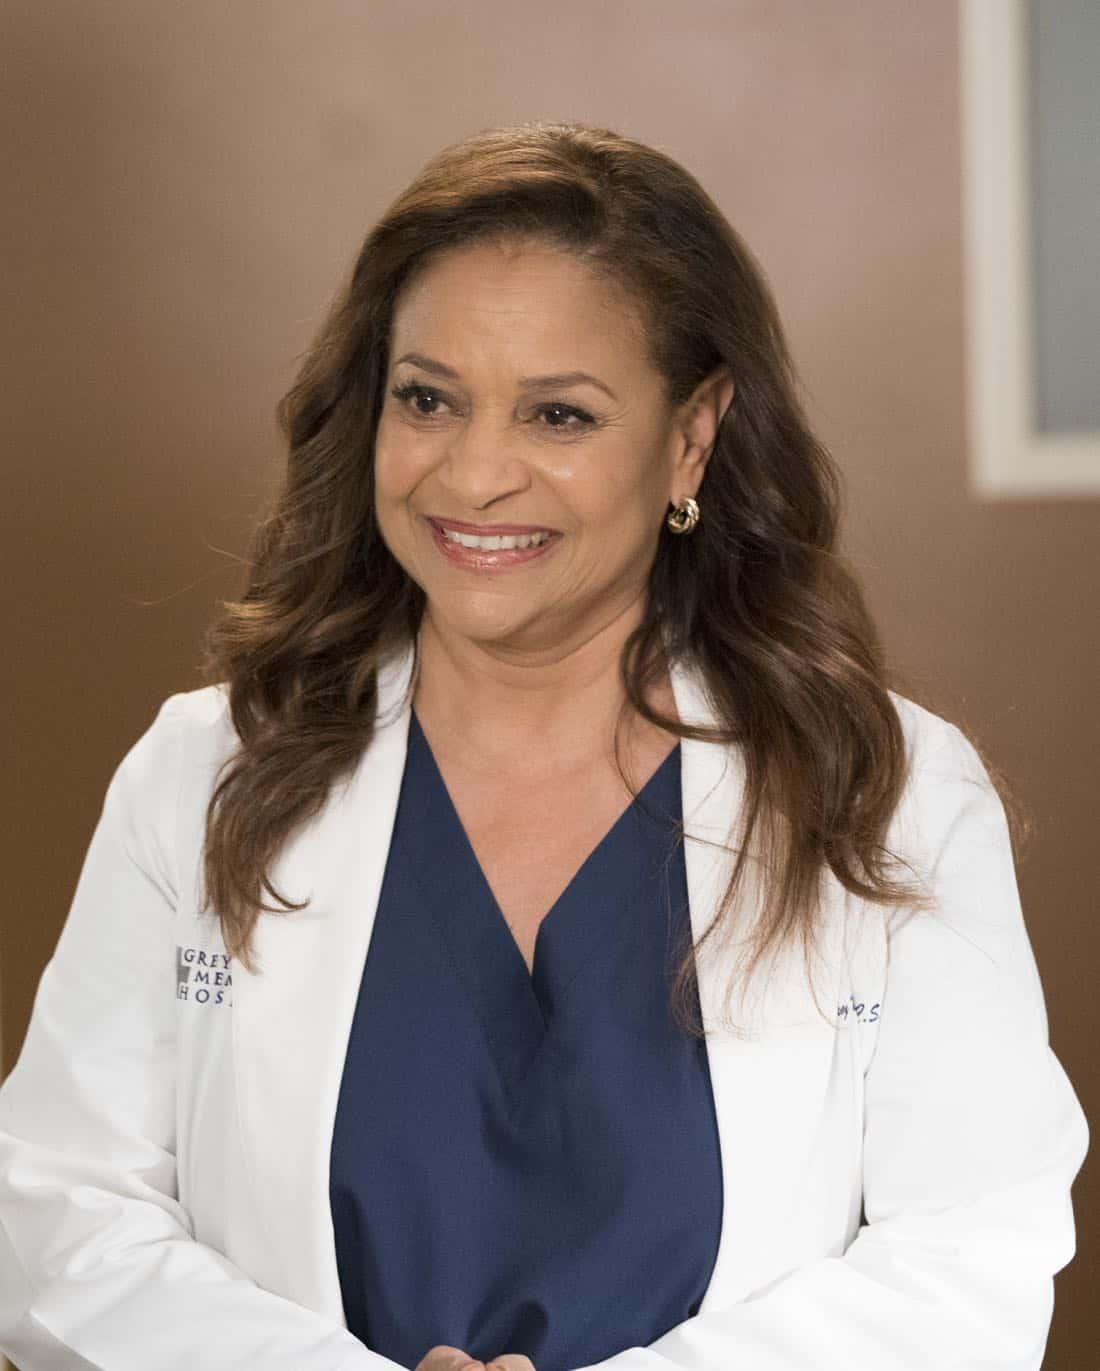 Greys Anatomy Episode 16 Season 14 Caught Somewhere In Time 10